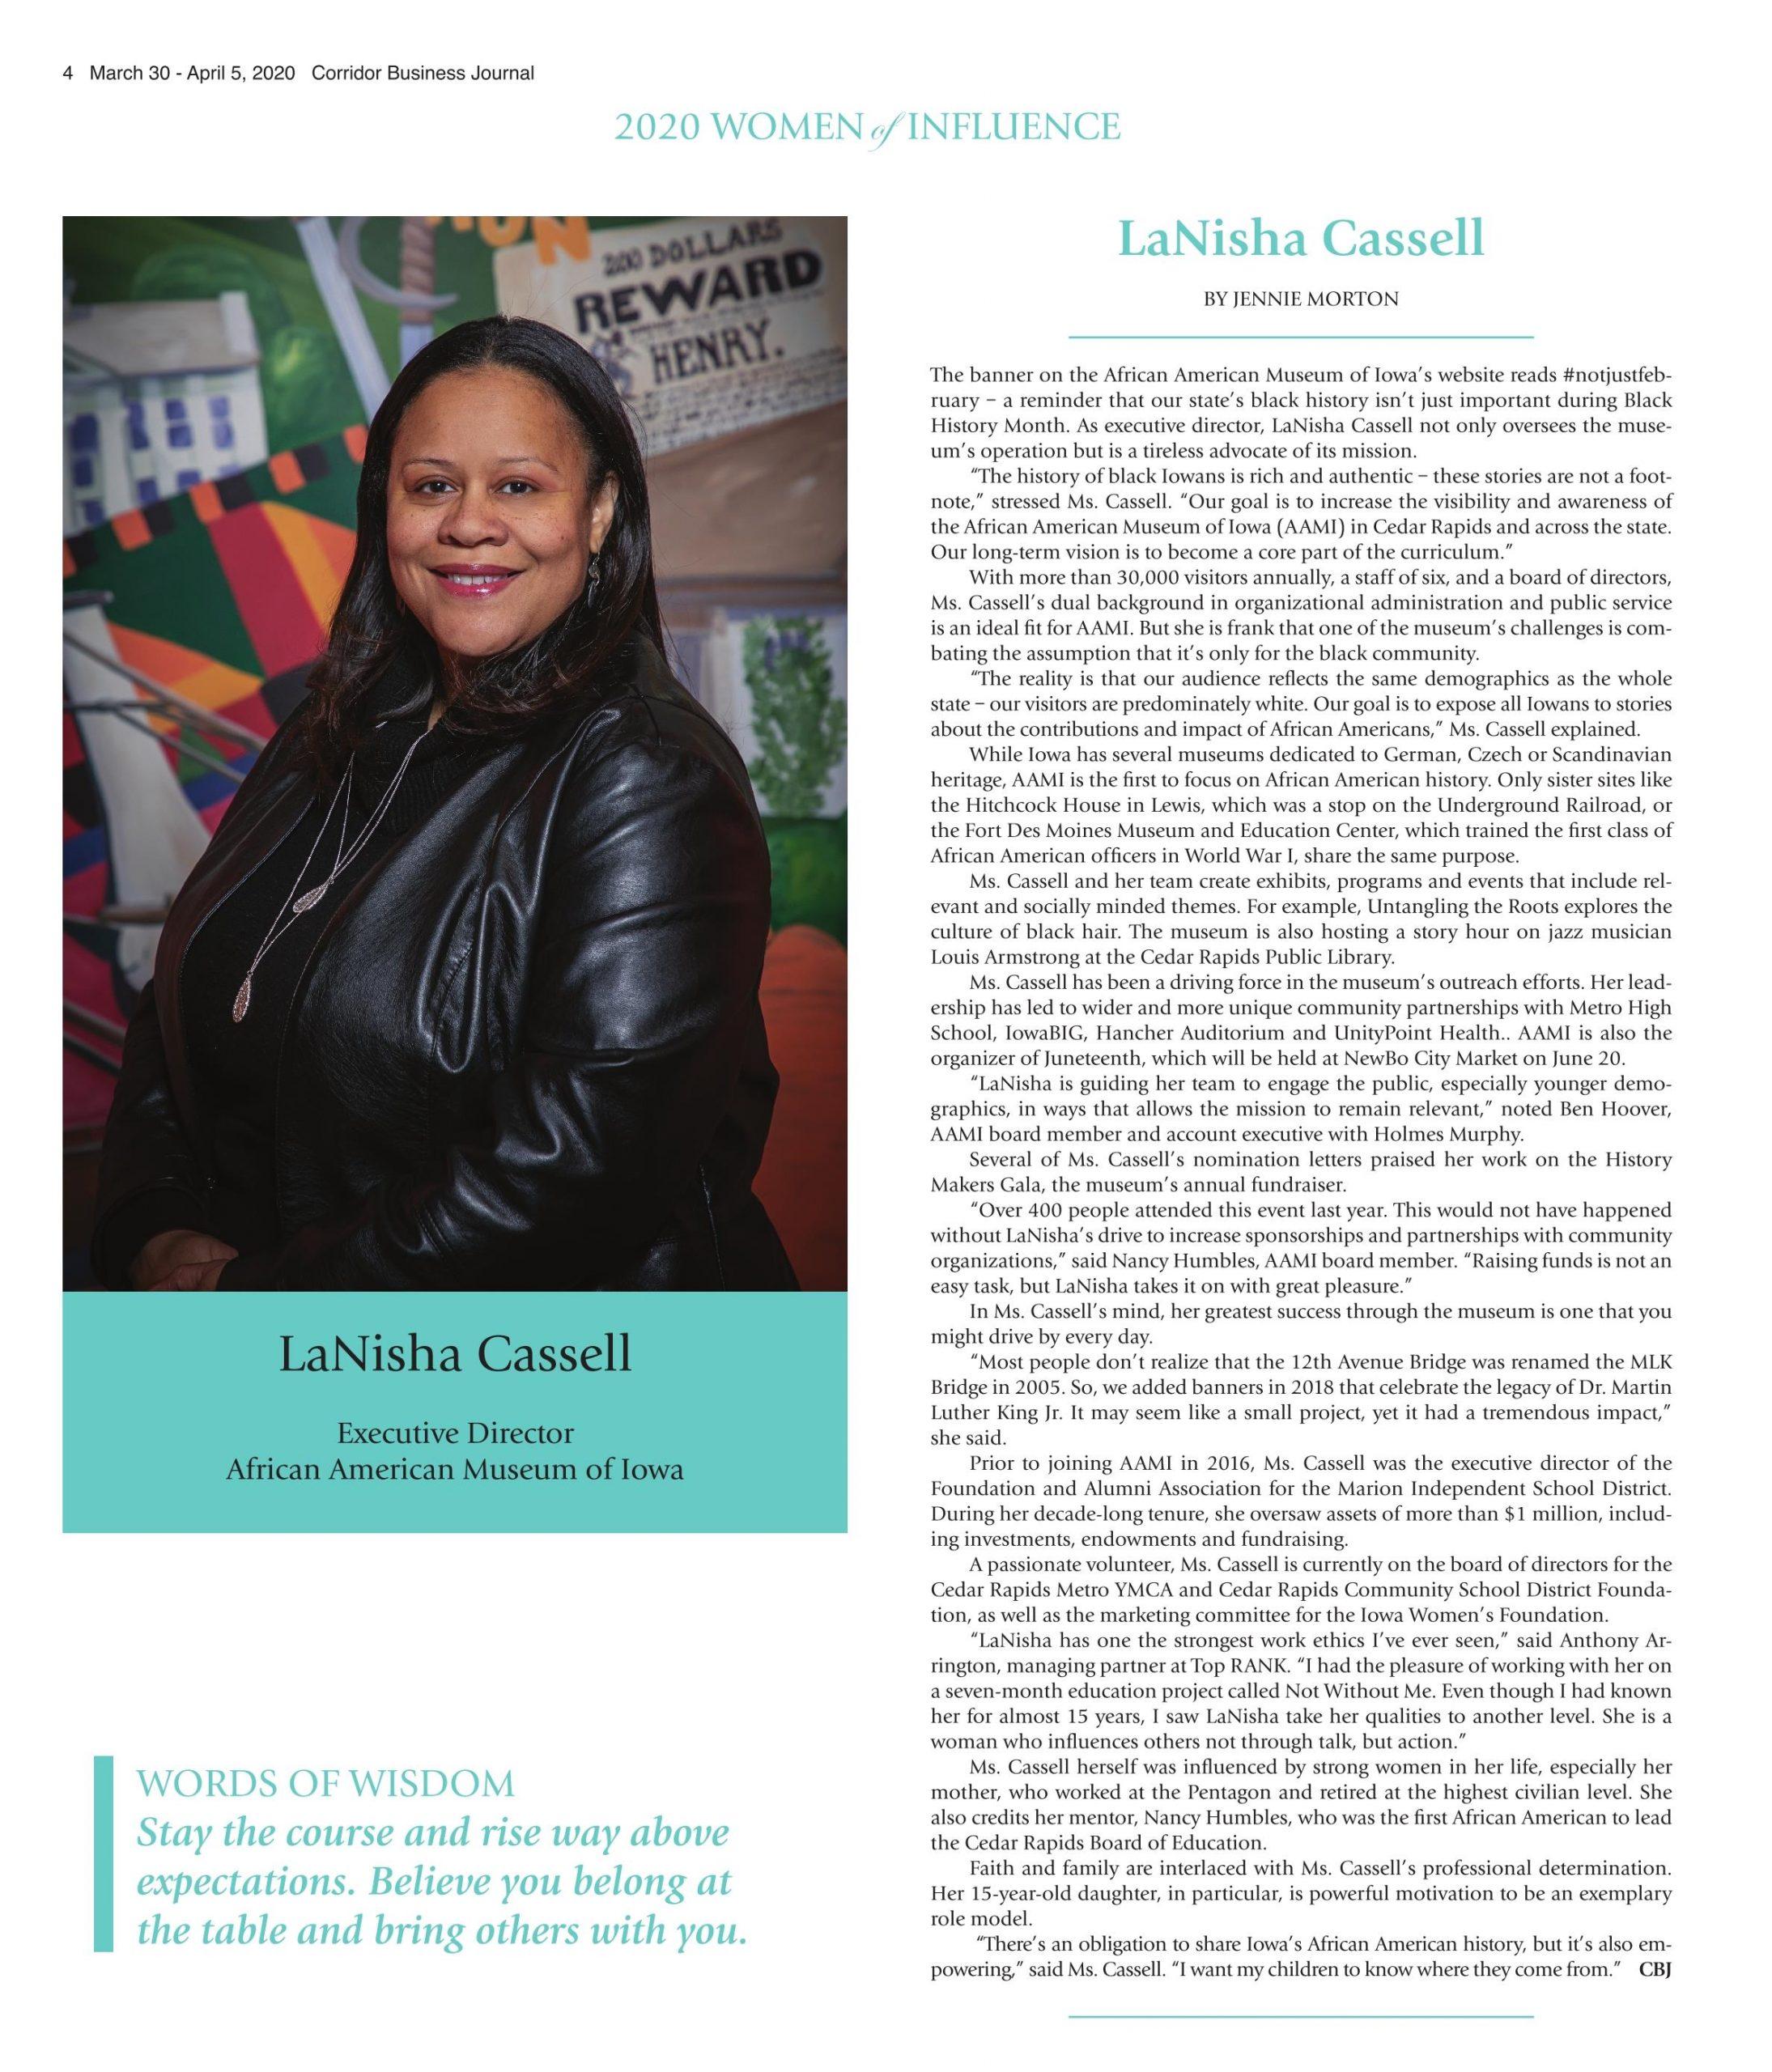 lanisha-cassell